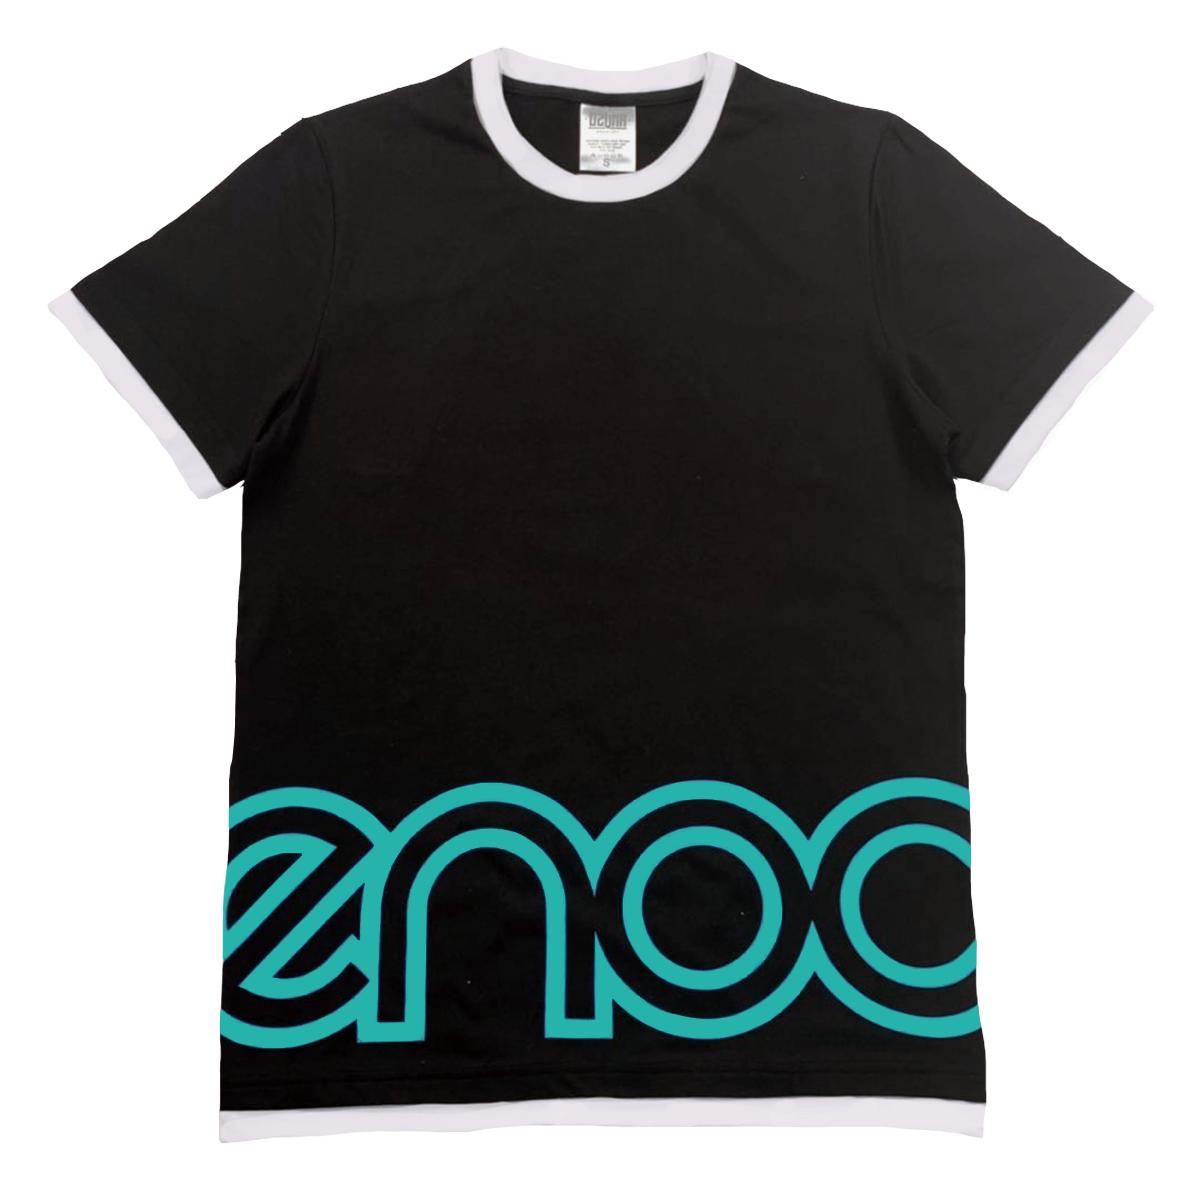 ENOC Camiseta de Timbre Negra